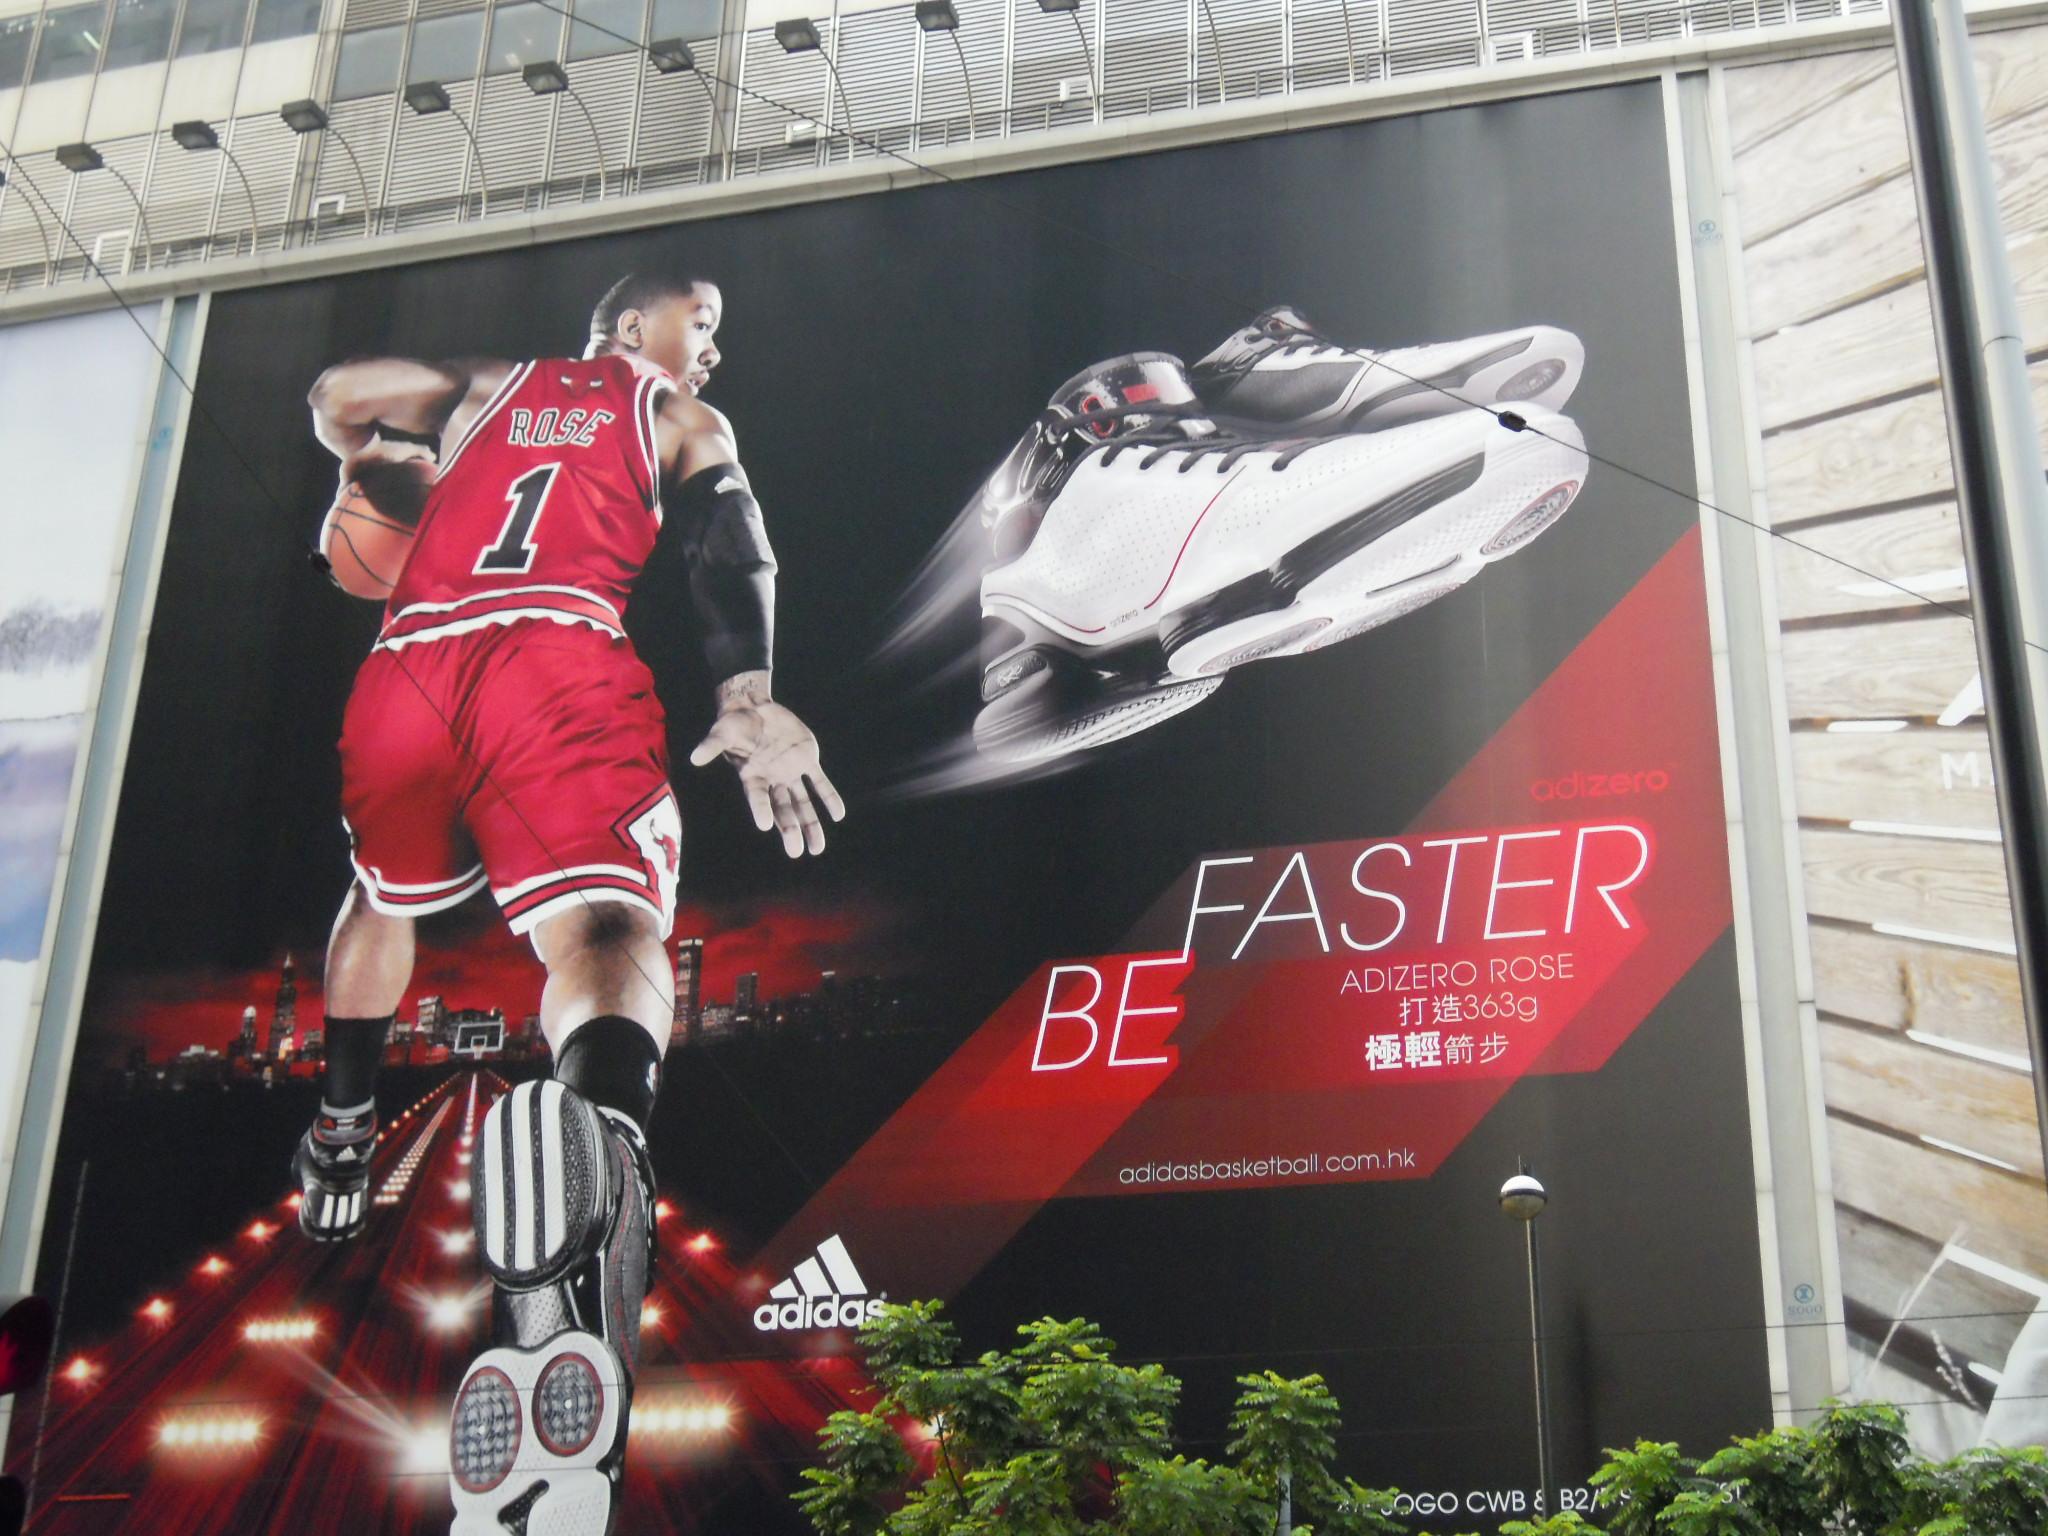 Adidas Vs Nike Billboards Breathing Asia Living Singapore